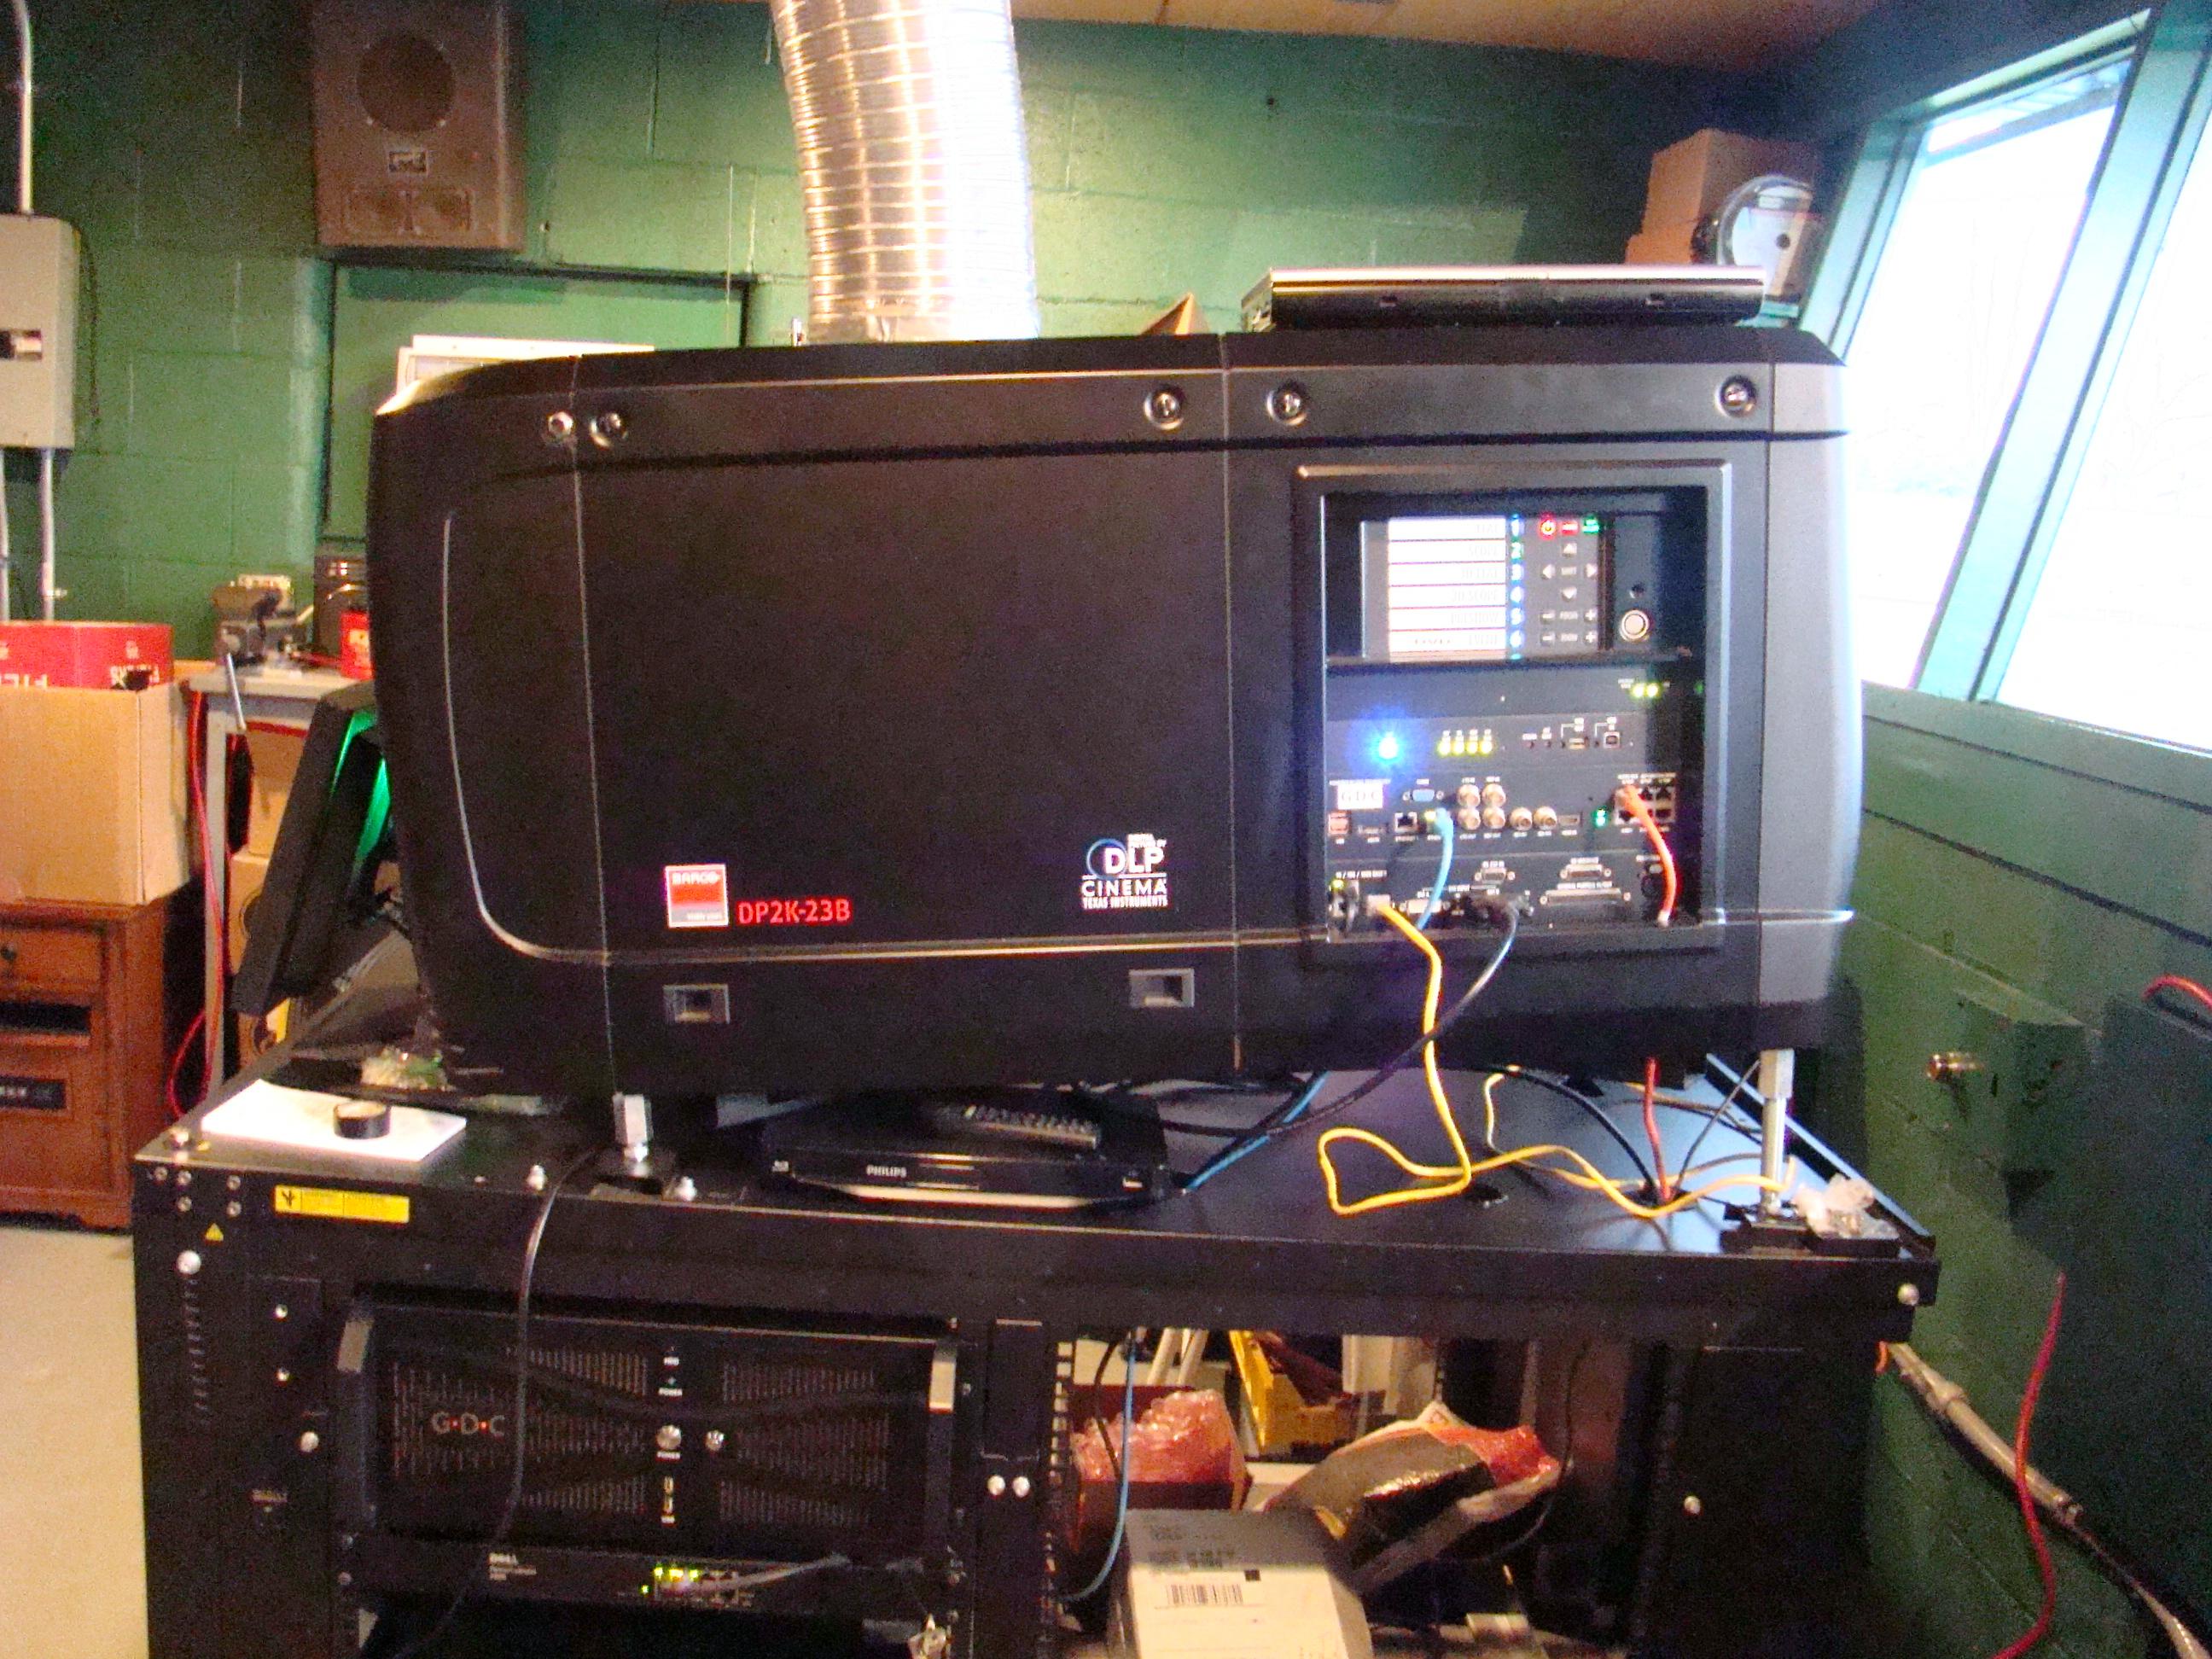 Lynn's digital projector